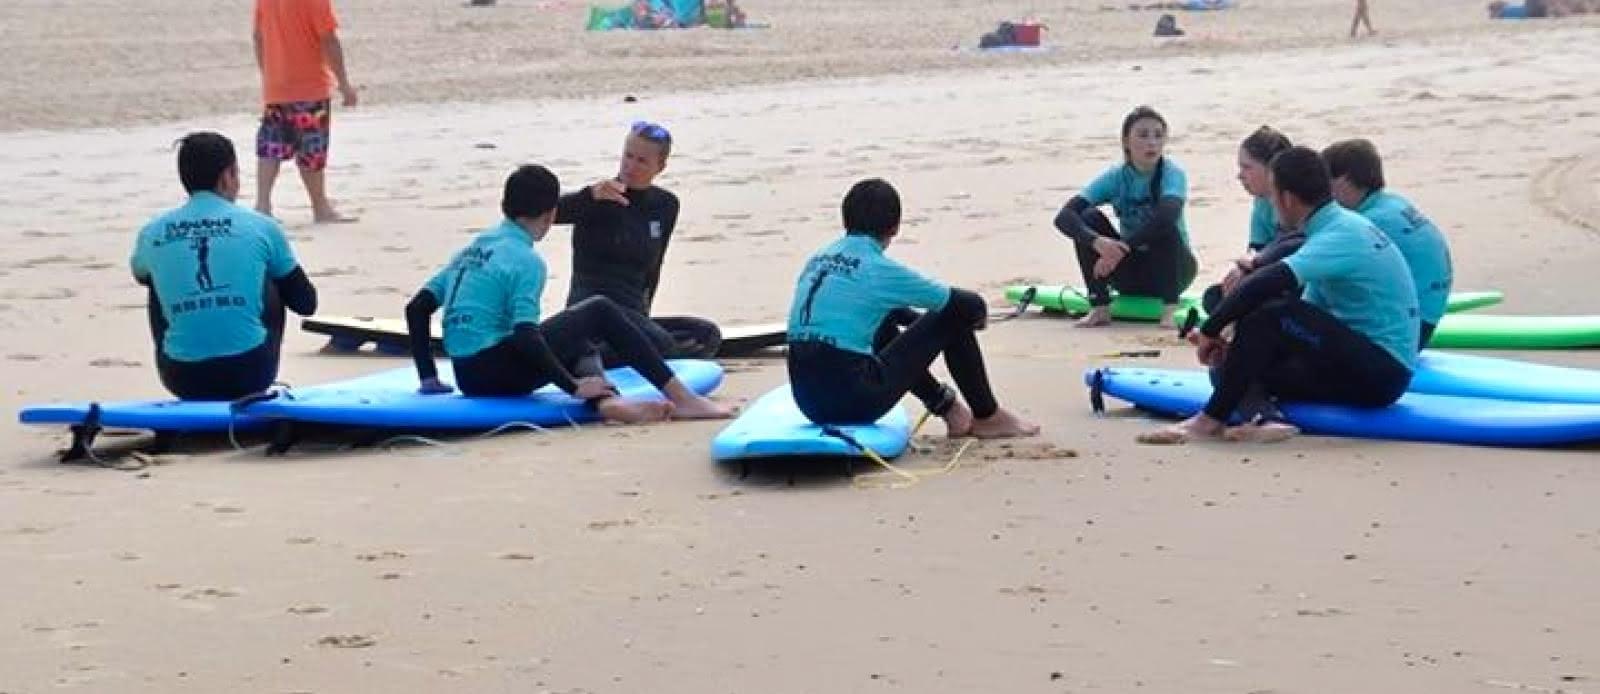 Ecole de Surf-Banana Surf School-Lacanau (4)